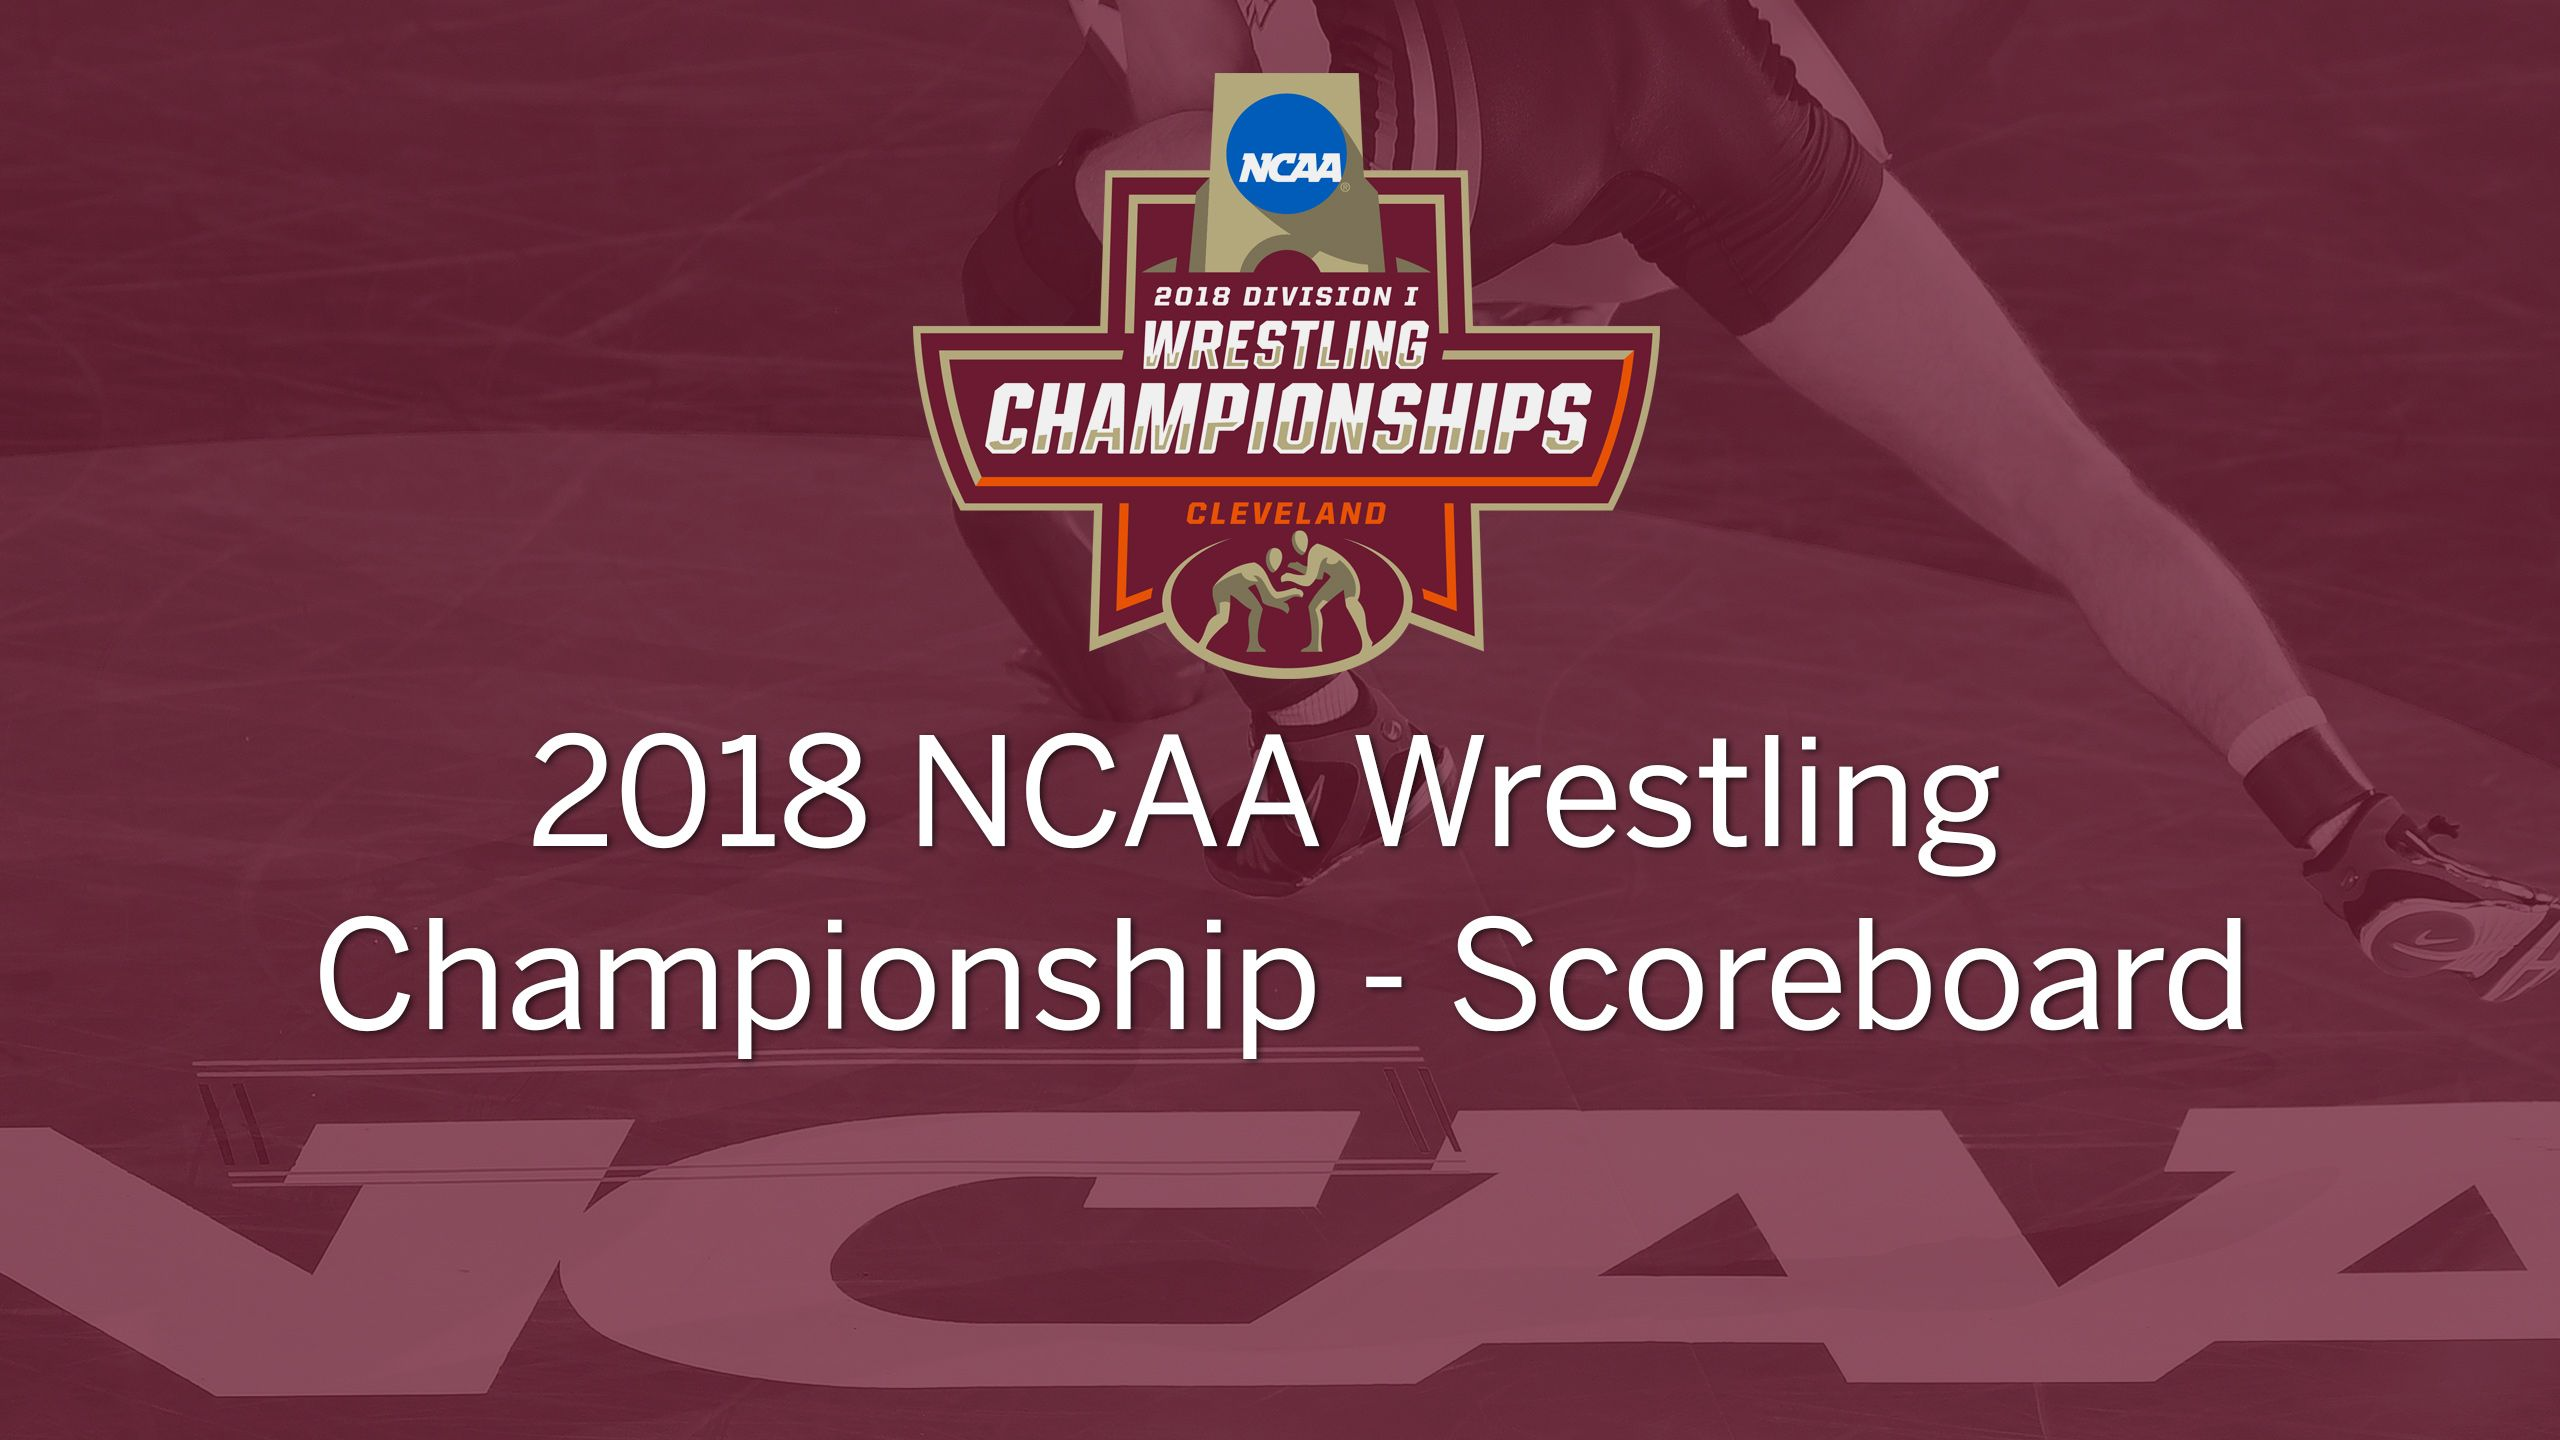 2018 NCAA Wrestling Championship Scoreboard